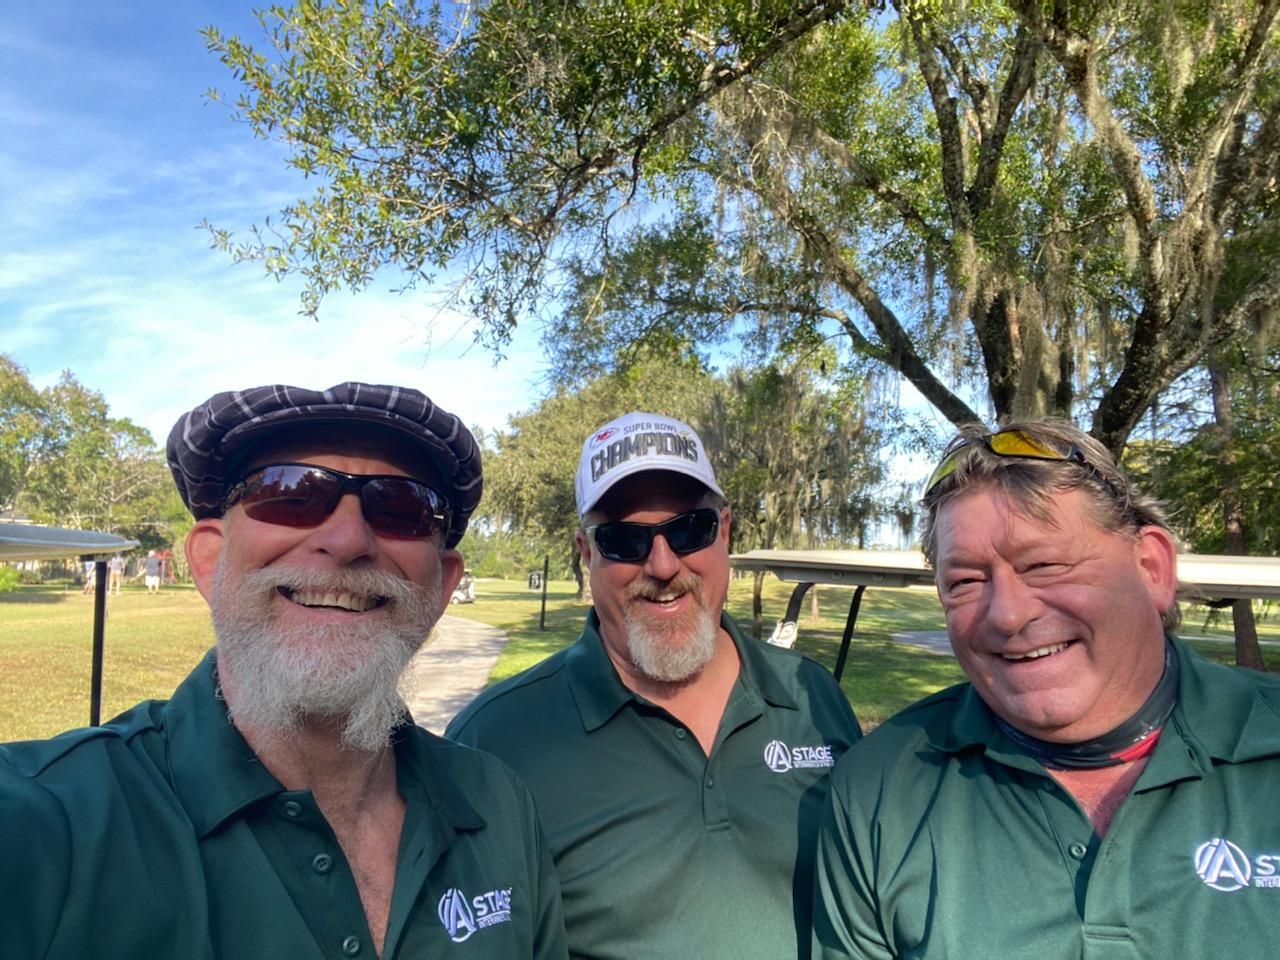 Greg Keatley, Greg Fecher, and John Gitzy at 5th Annual Survivor's Golf Tournament